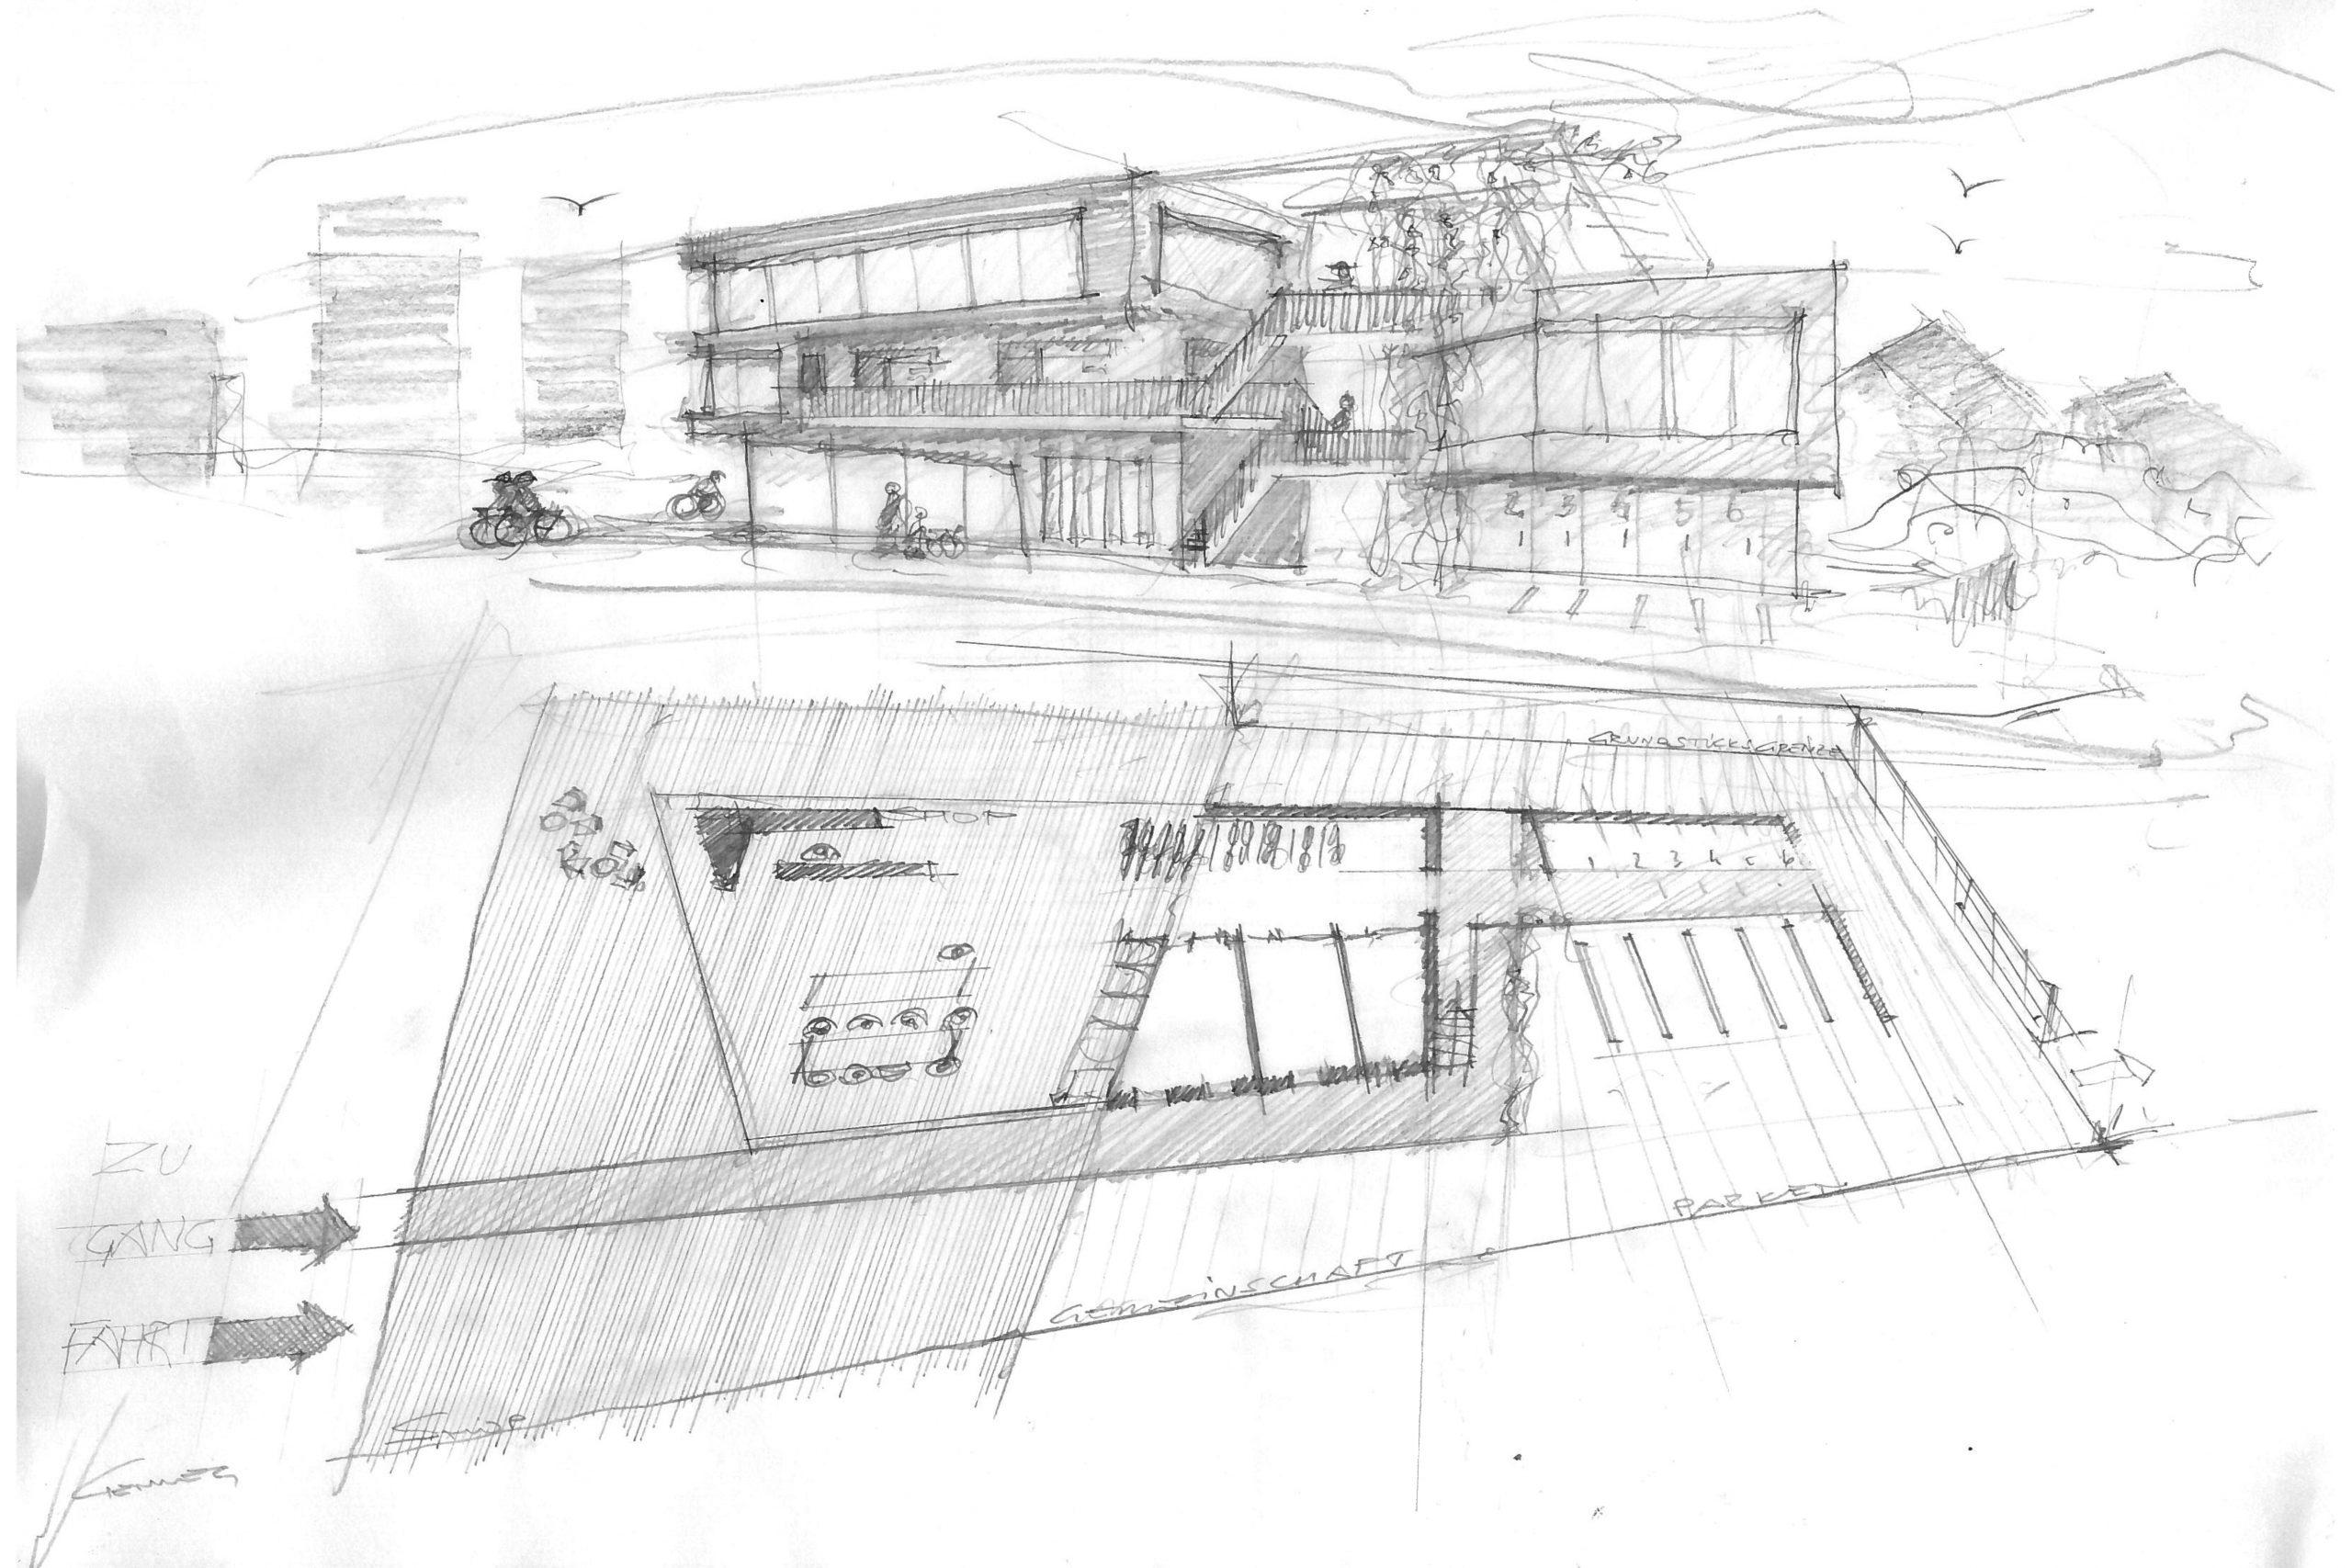 Rostocker Strasse, concept sketch